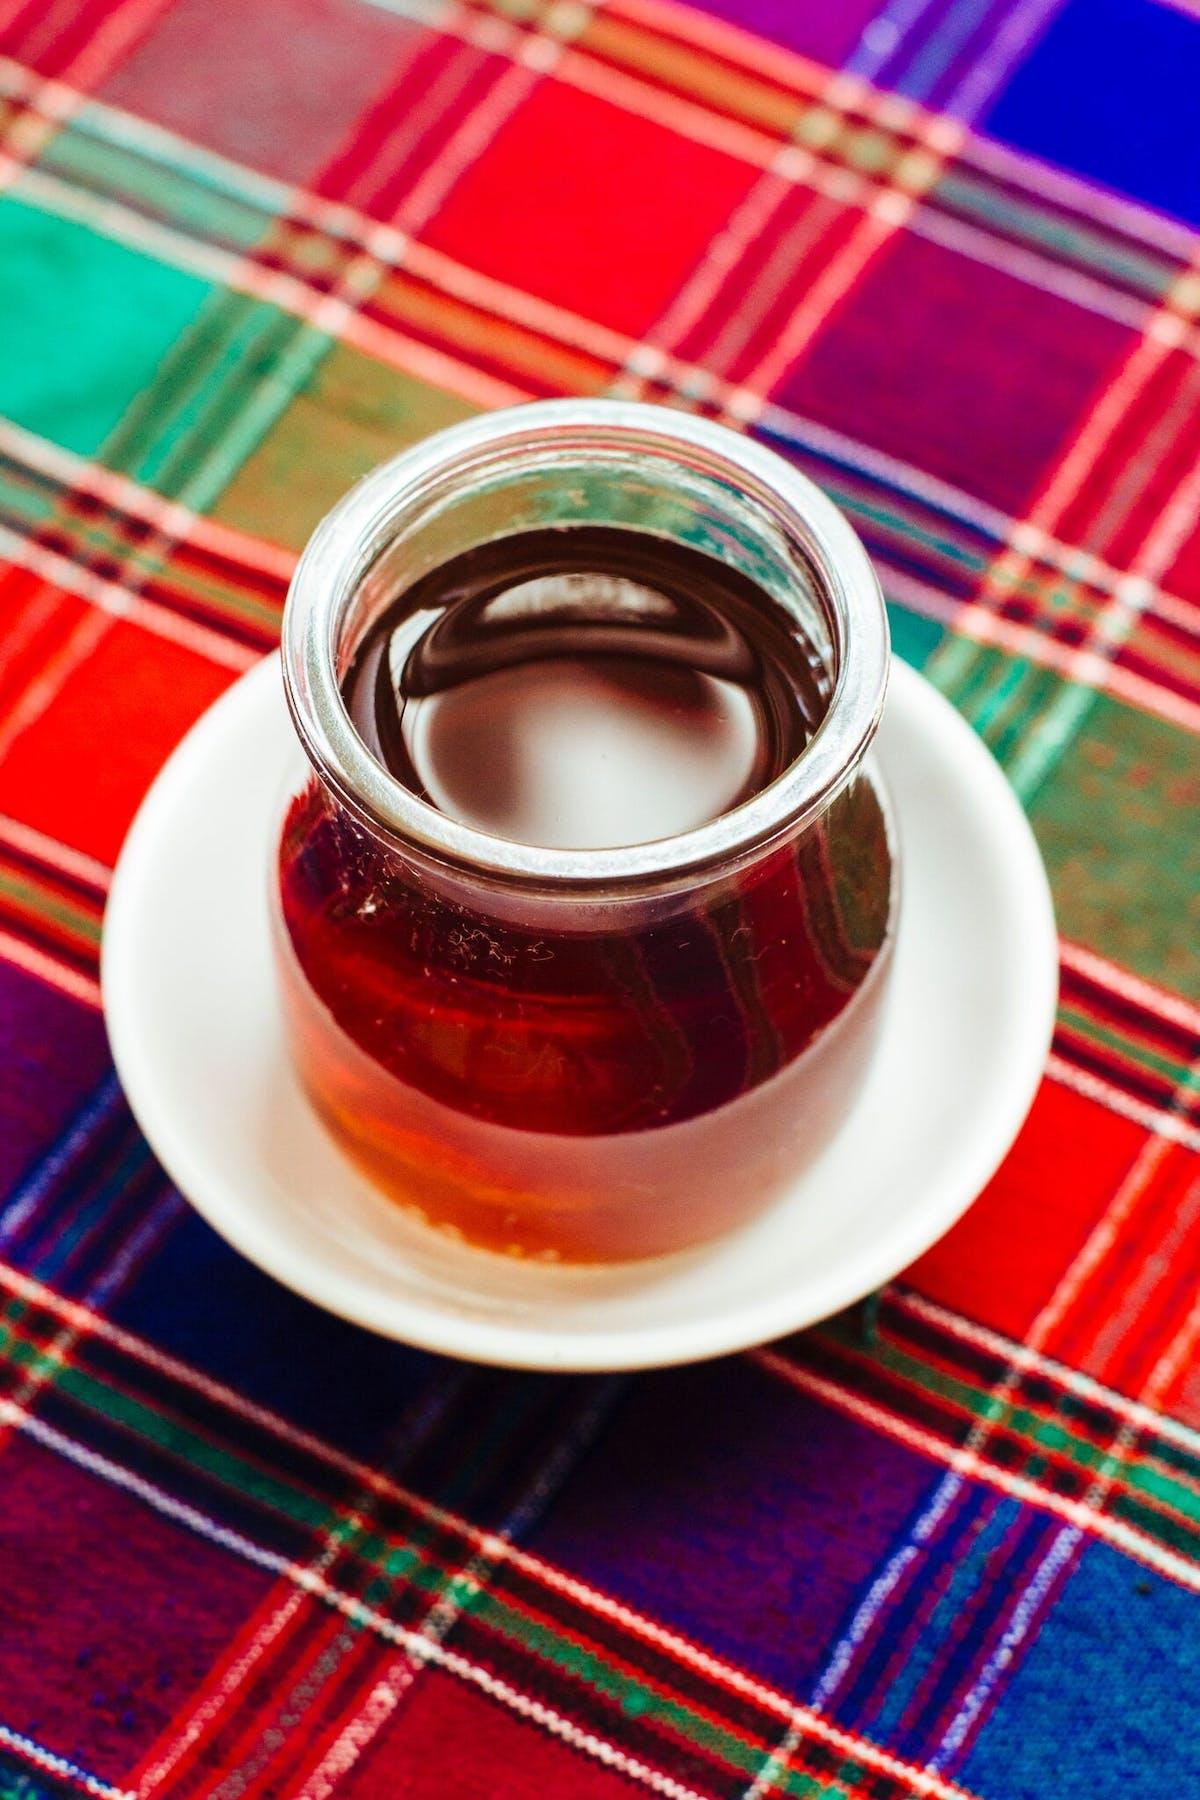 a close up of a plate with a fork and a cup of coffee